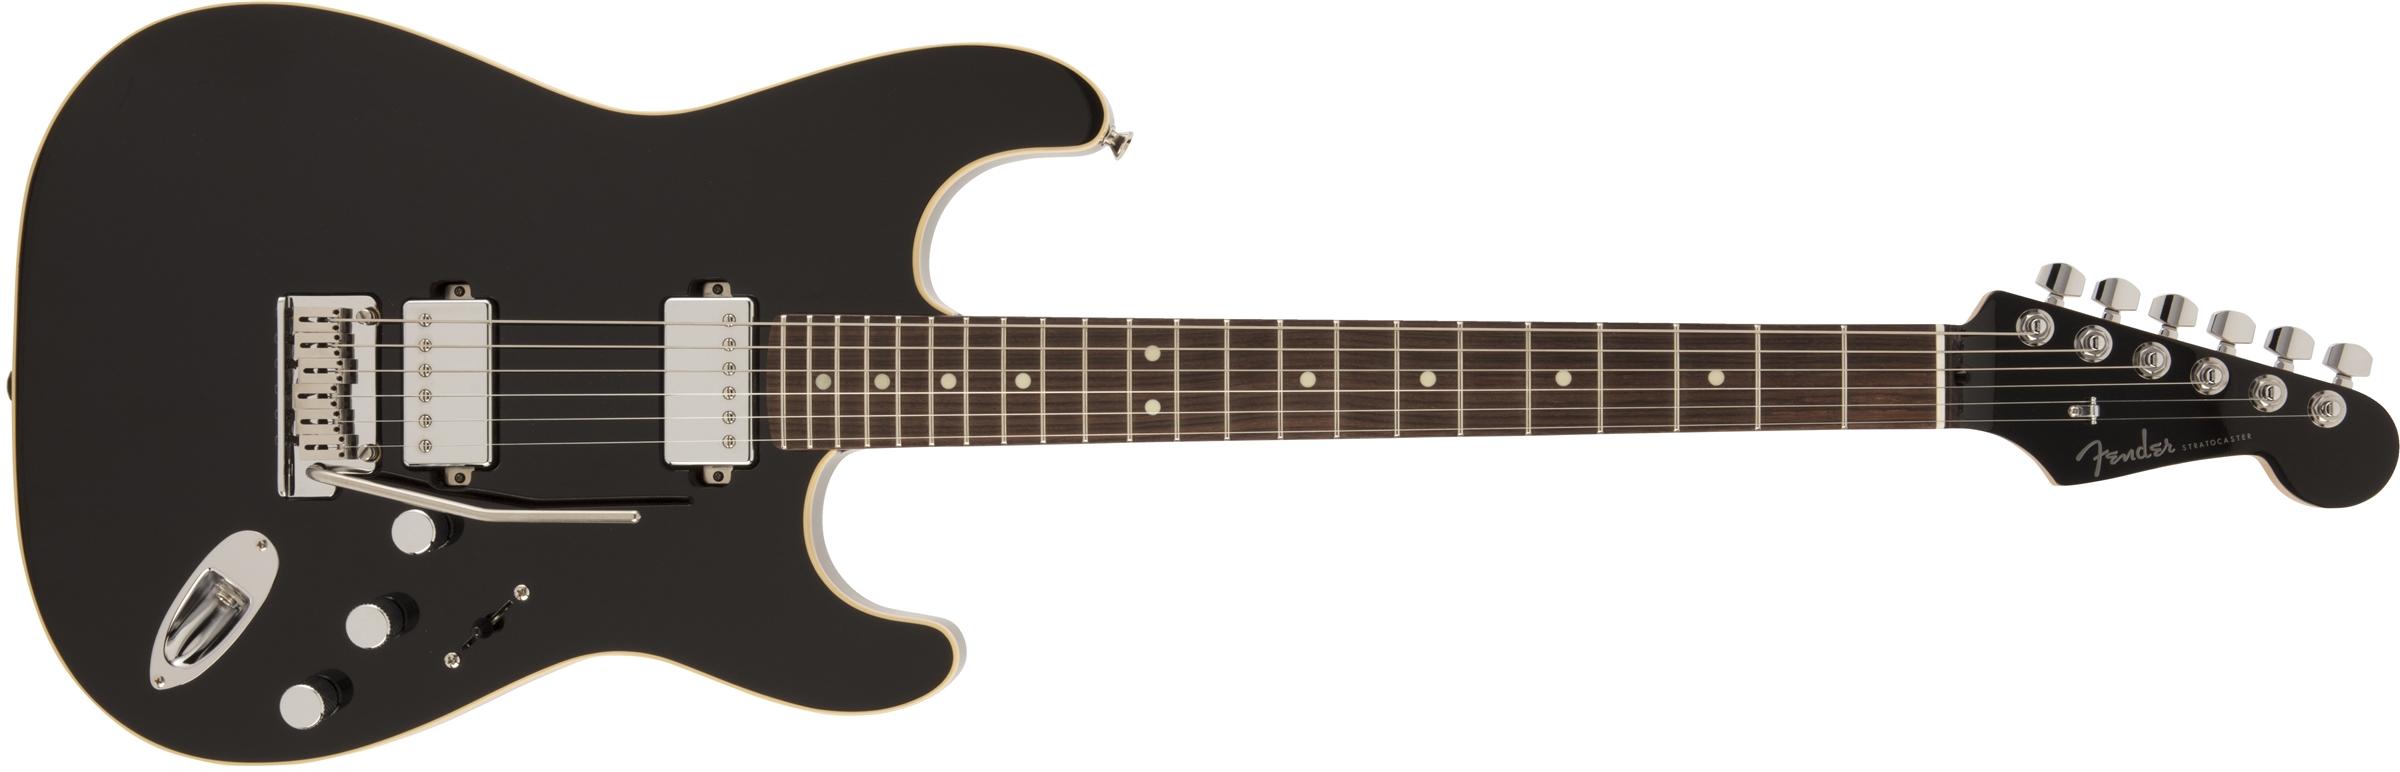 A Japan-only Fender Modern Stratocaster